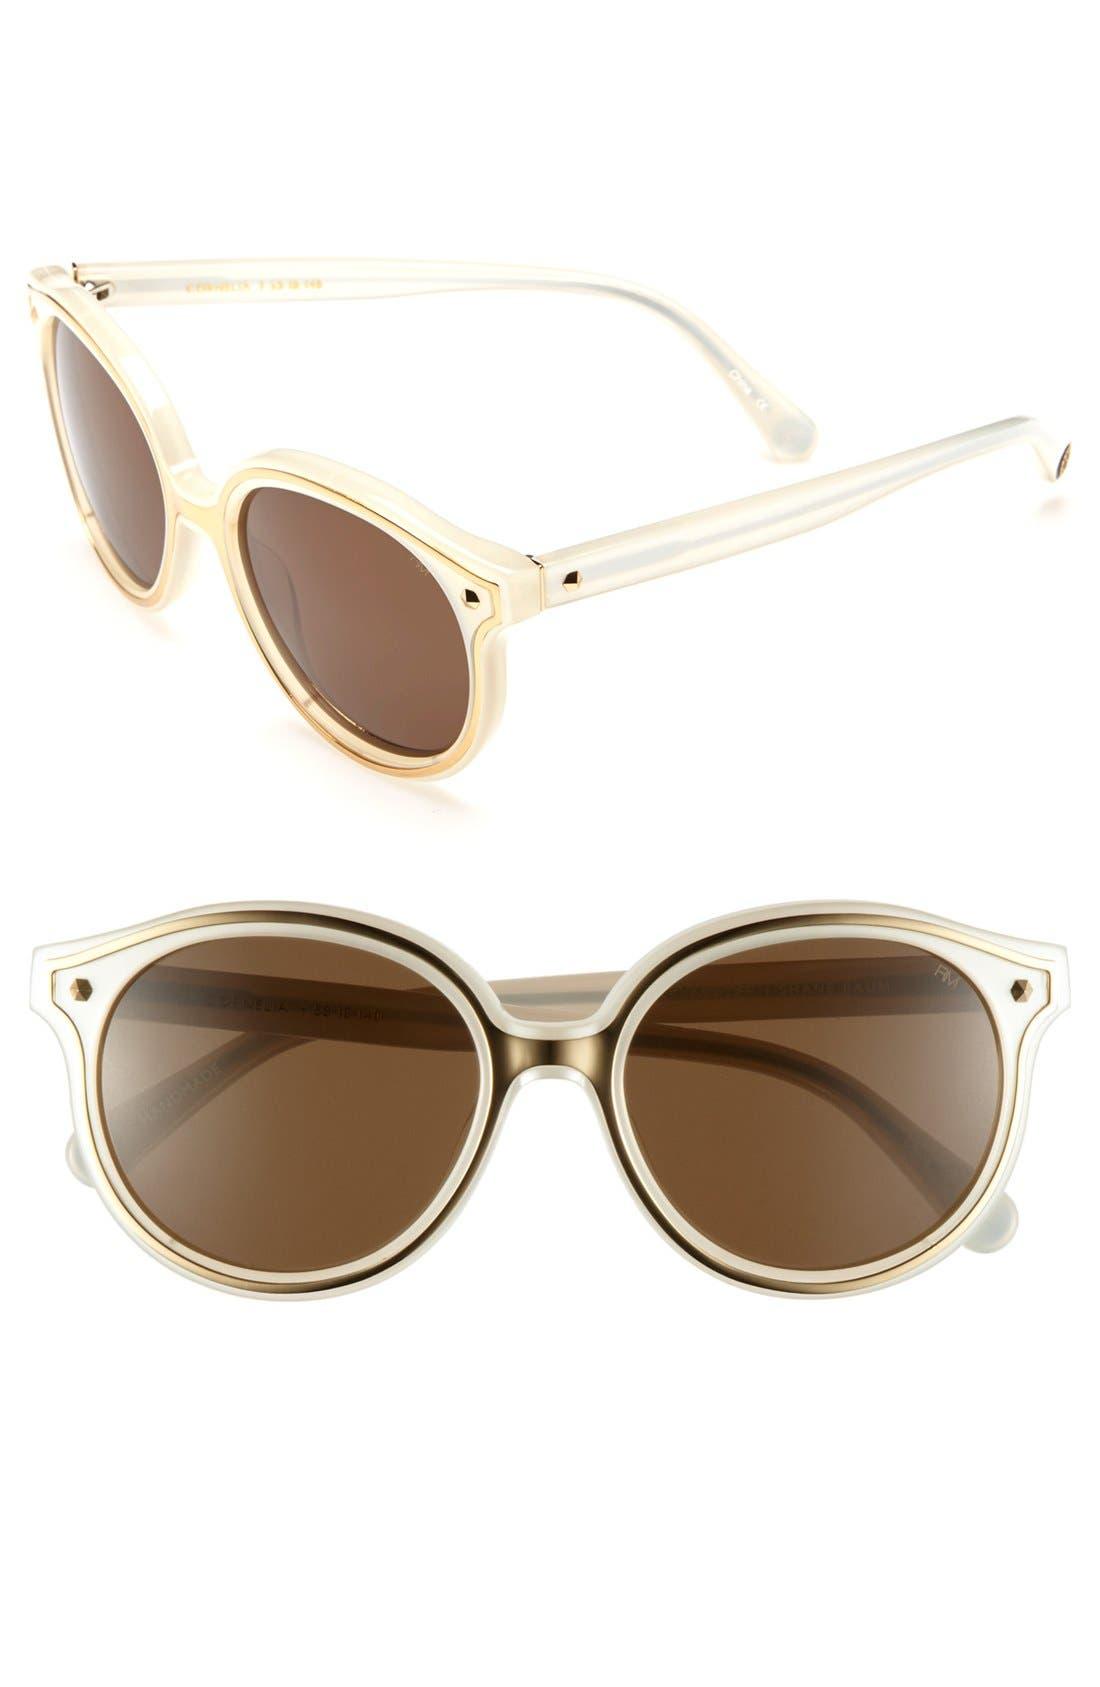 Main Image - Rebecca Minkoff 'Cornelia' 53mm Sunglasses